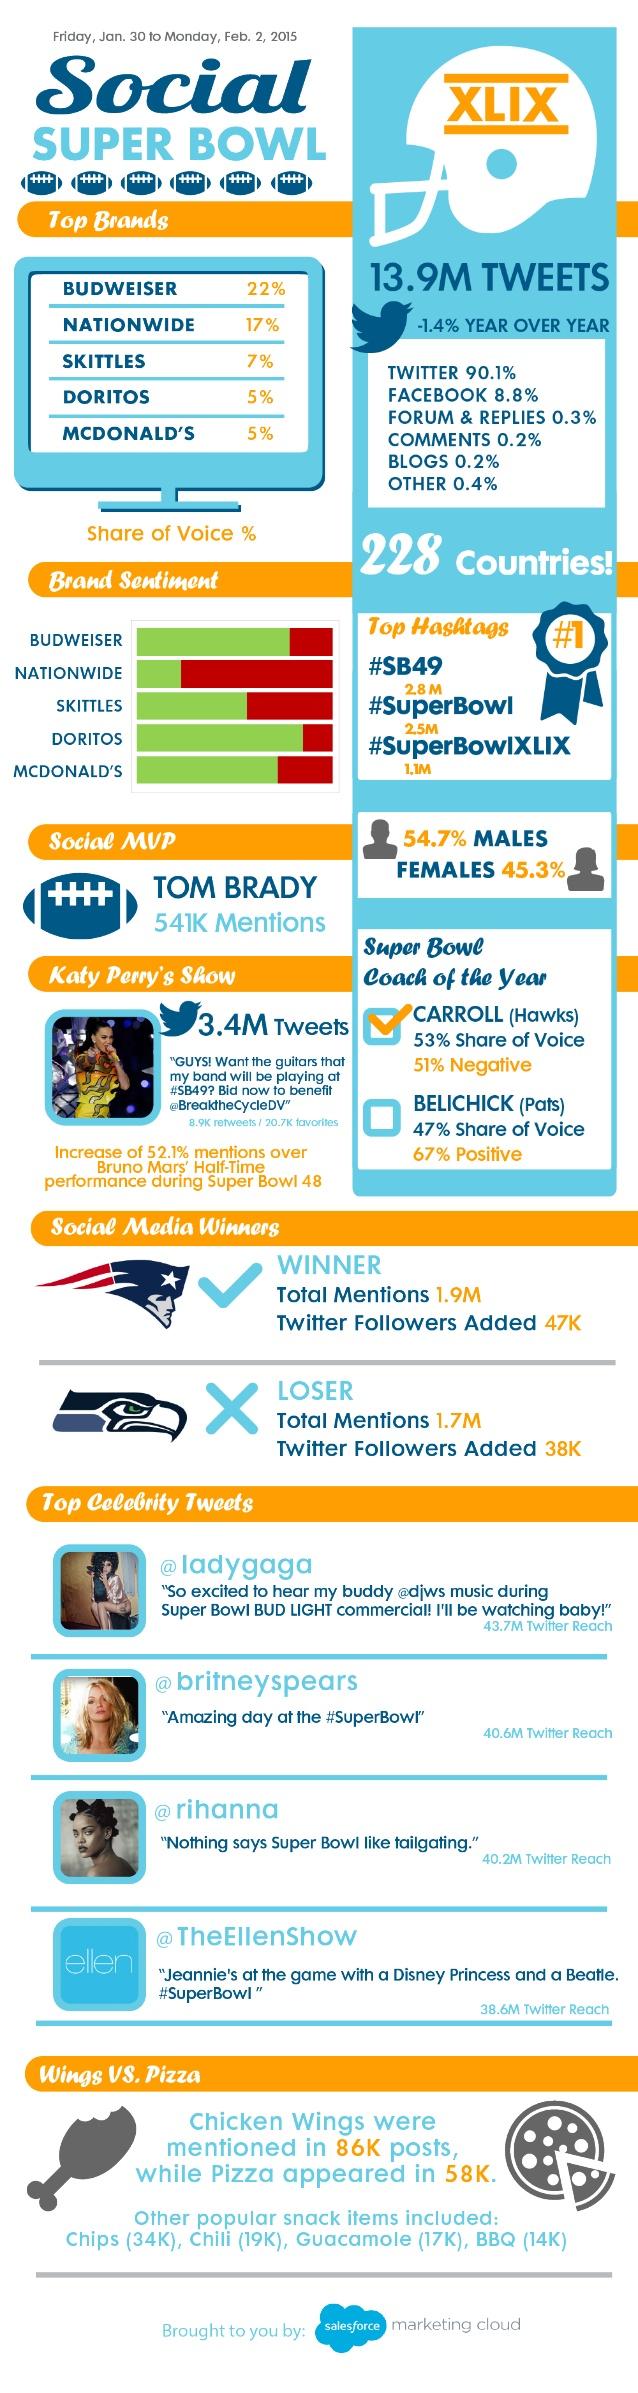 Super Bowl 2015 en Redes Sociales